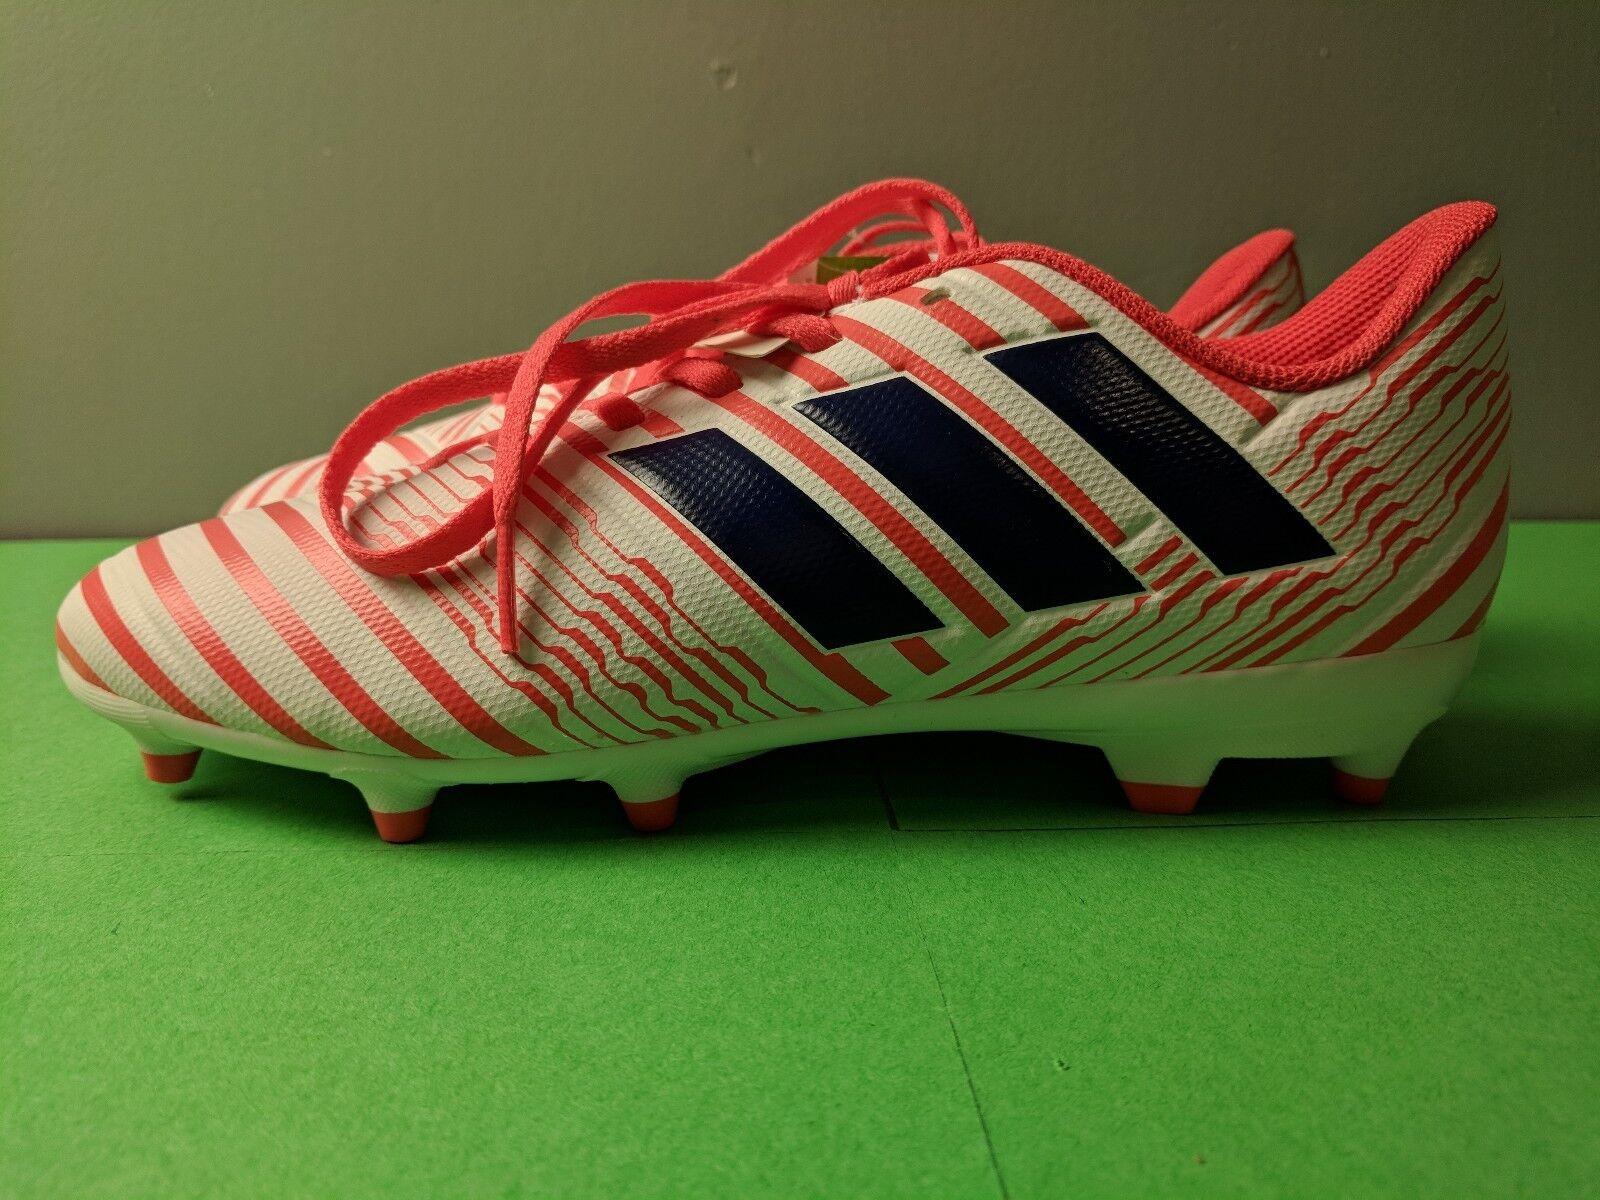 Brand New Adidas Performance Nemeziz 17.4 FG Woman's Soccer Shoes Women's Size 8